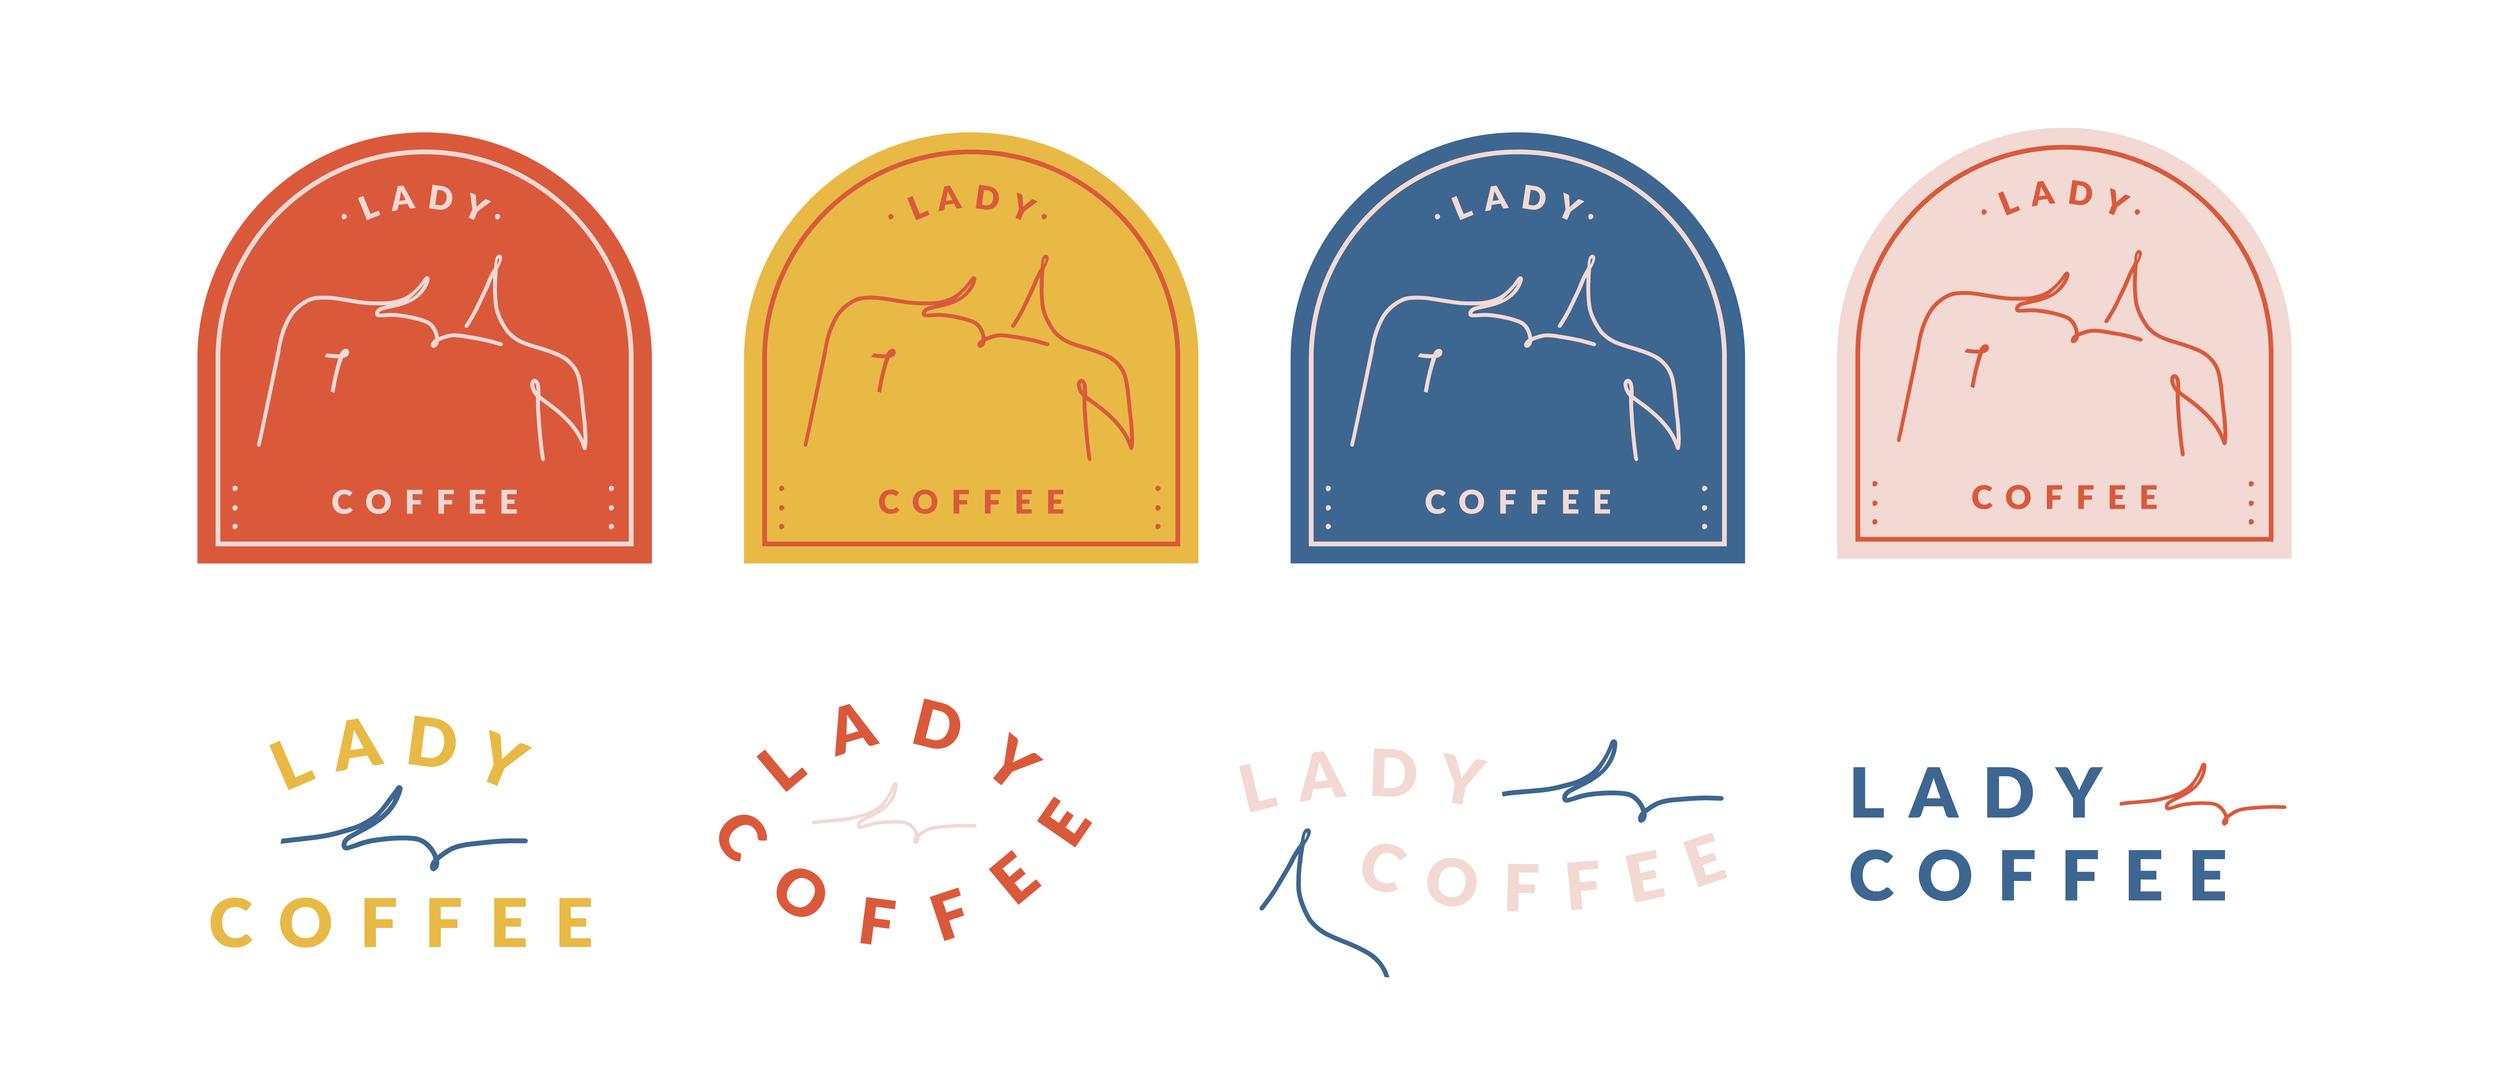 LadyCoffee-01.png